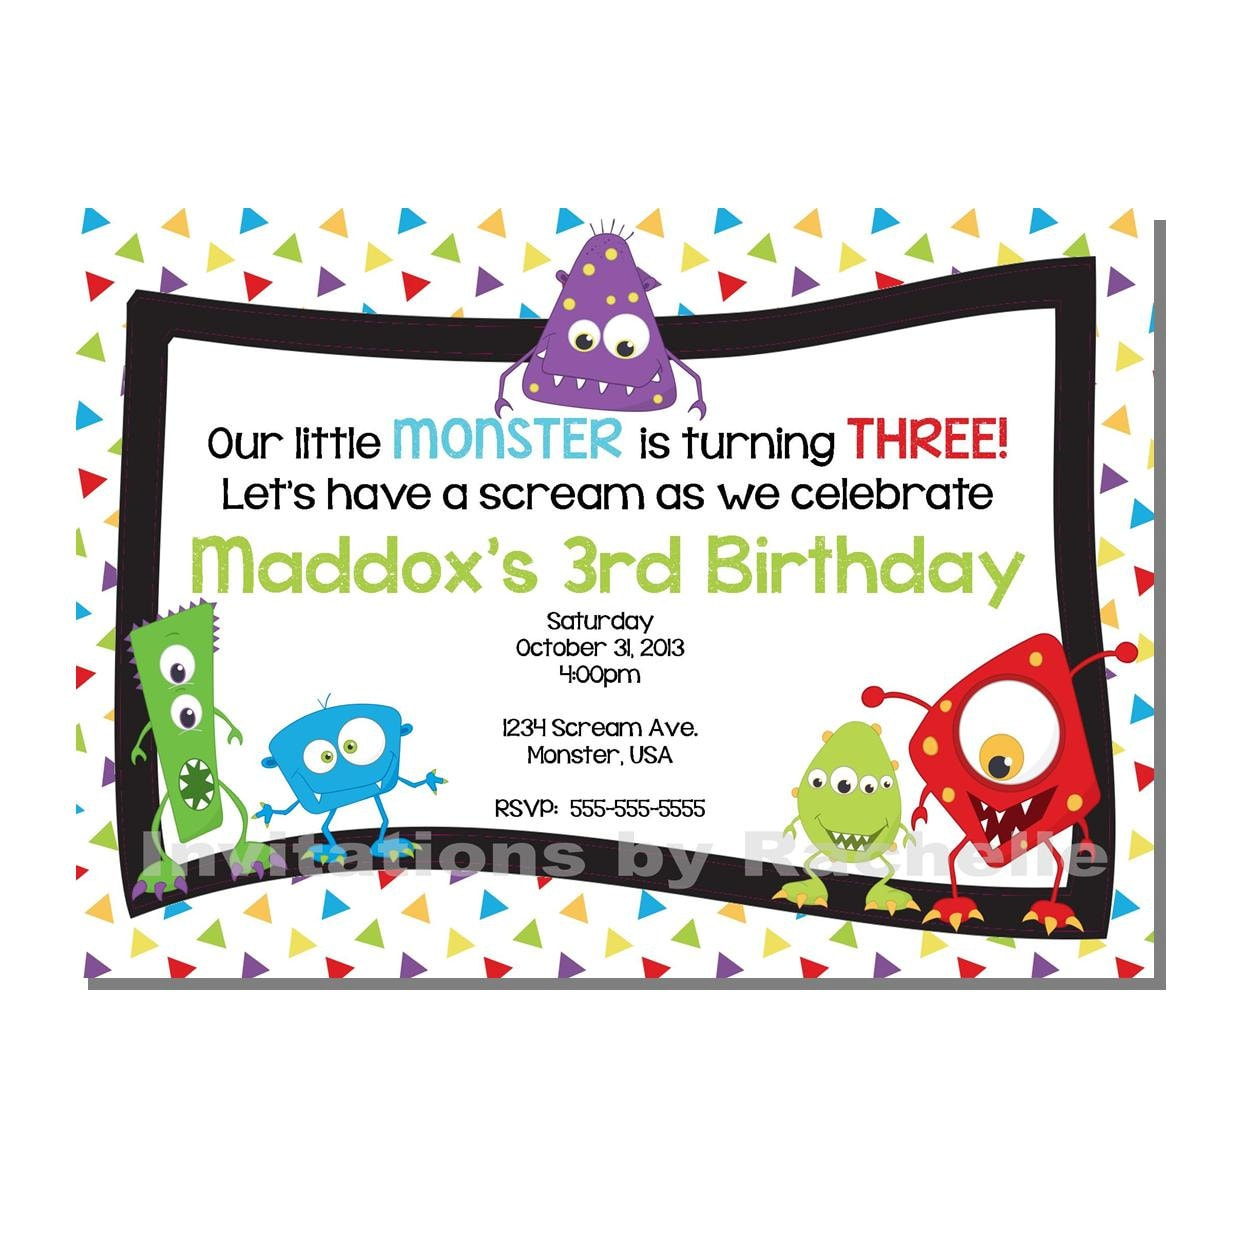 Monster Bash Invitation Birthday Party DIGITAL or PRINTED | Etsy